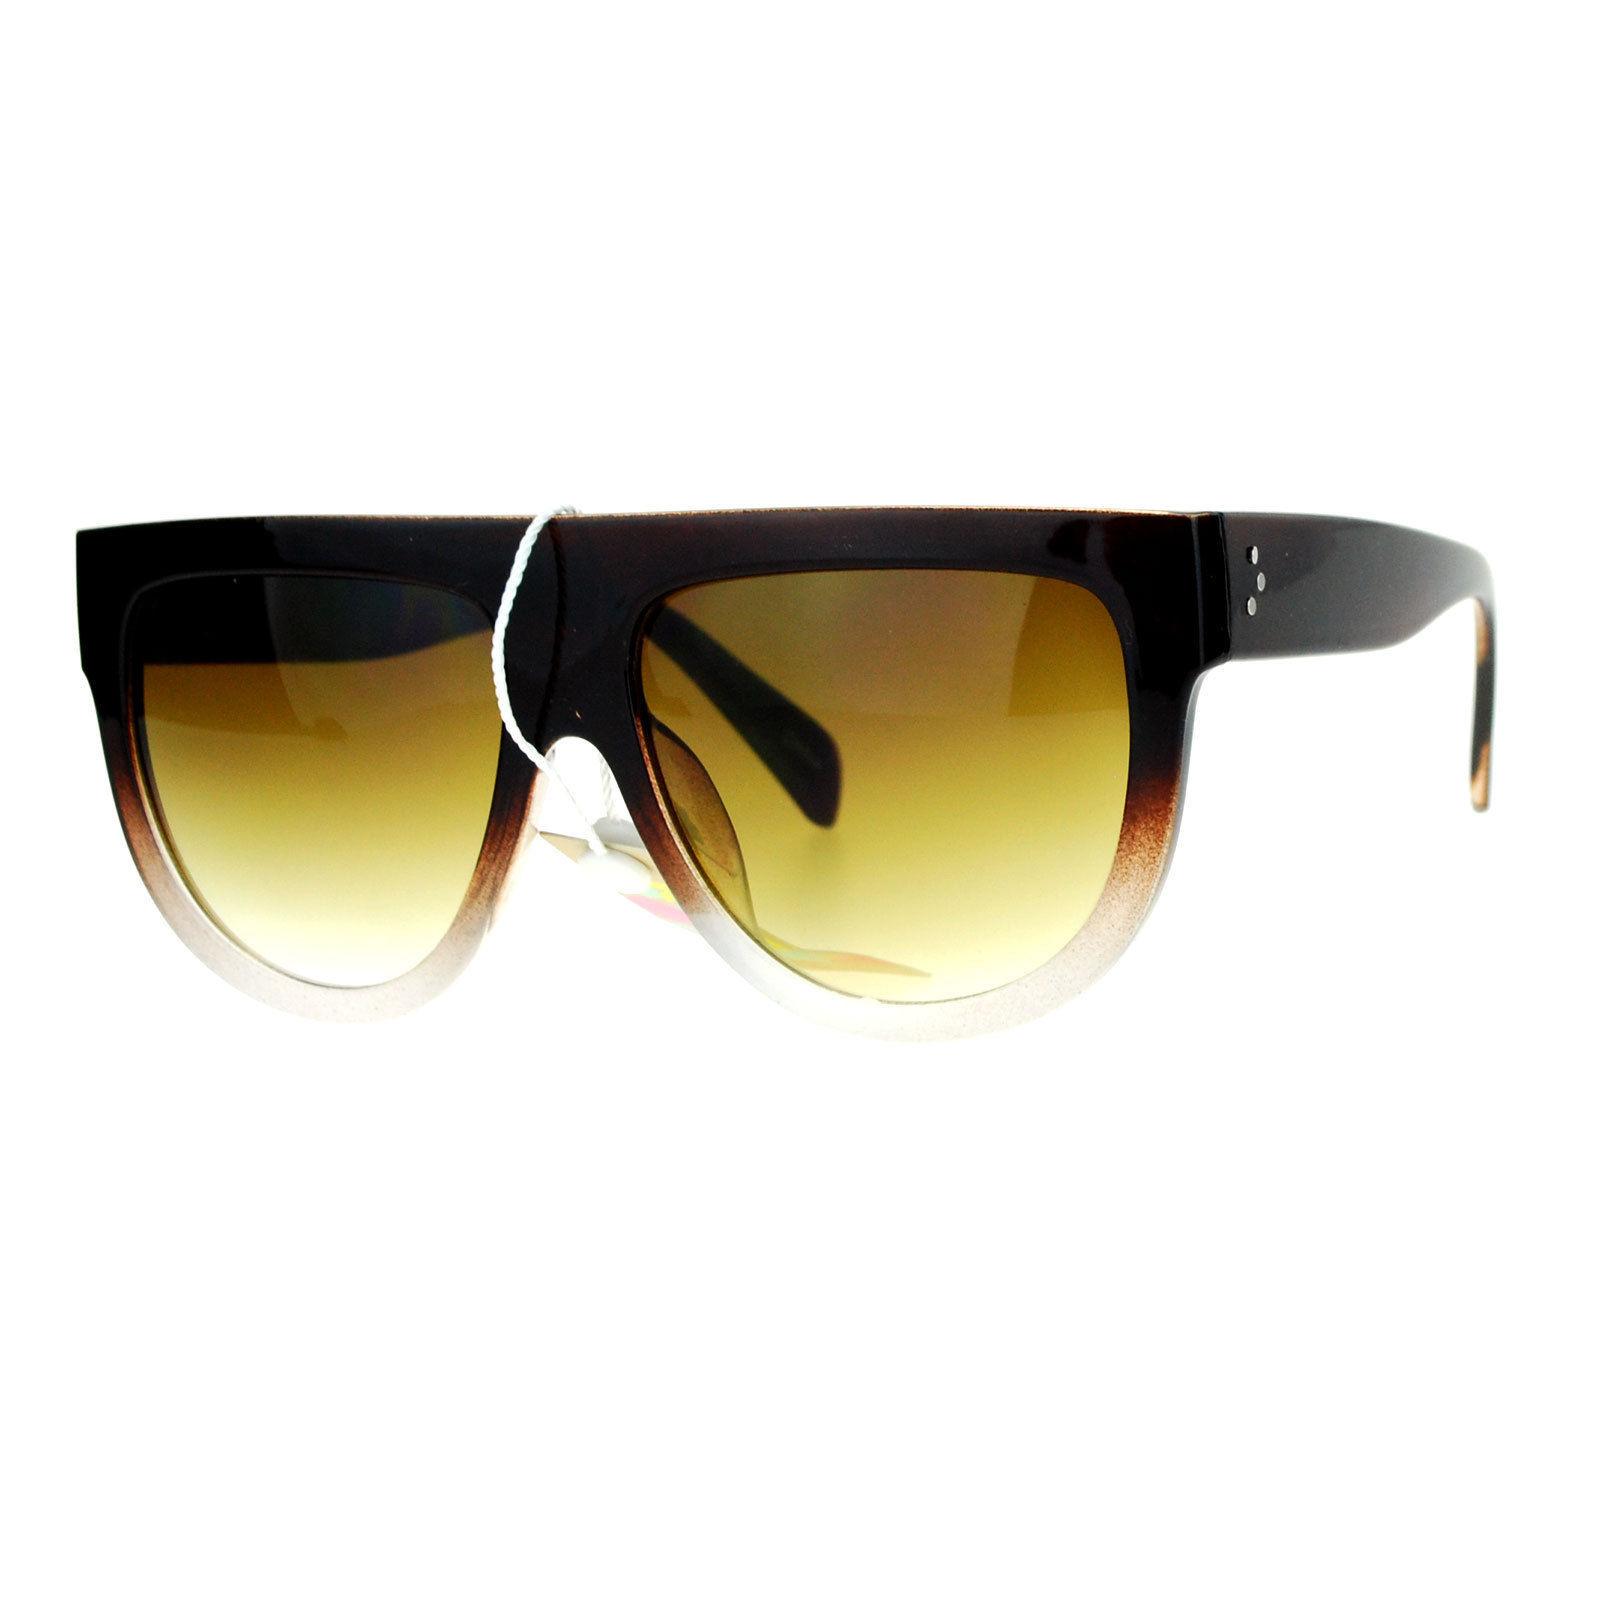 Designer Fashion Sunglasses Unisex Flat Top Hipster Trendy Shades UV400